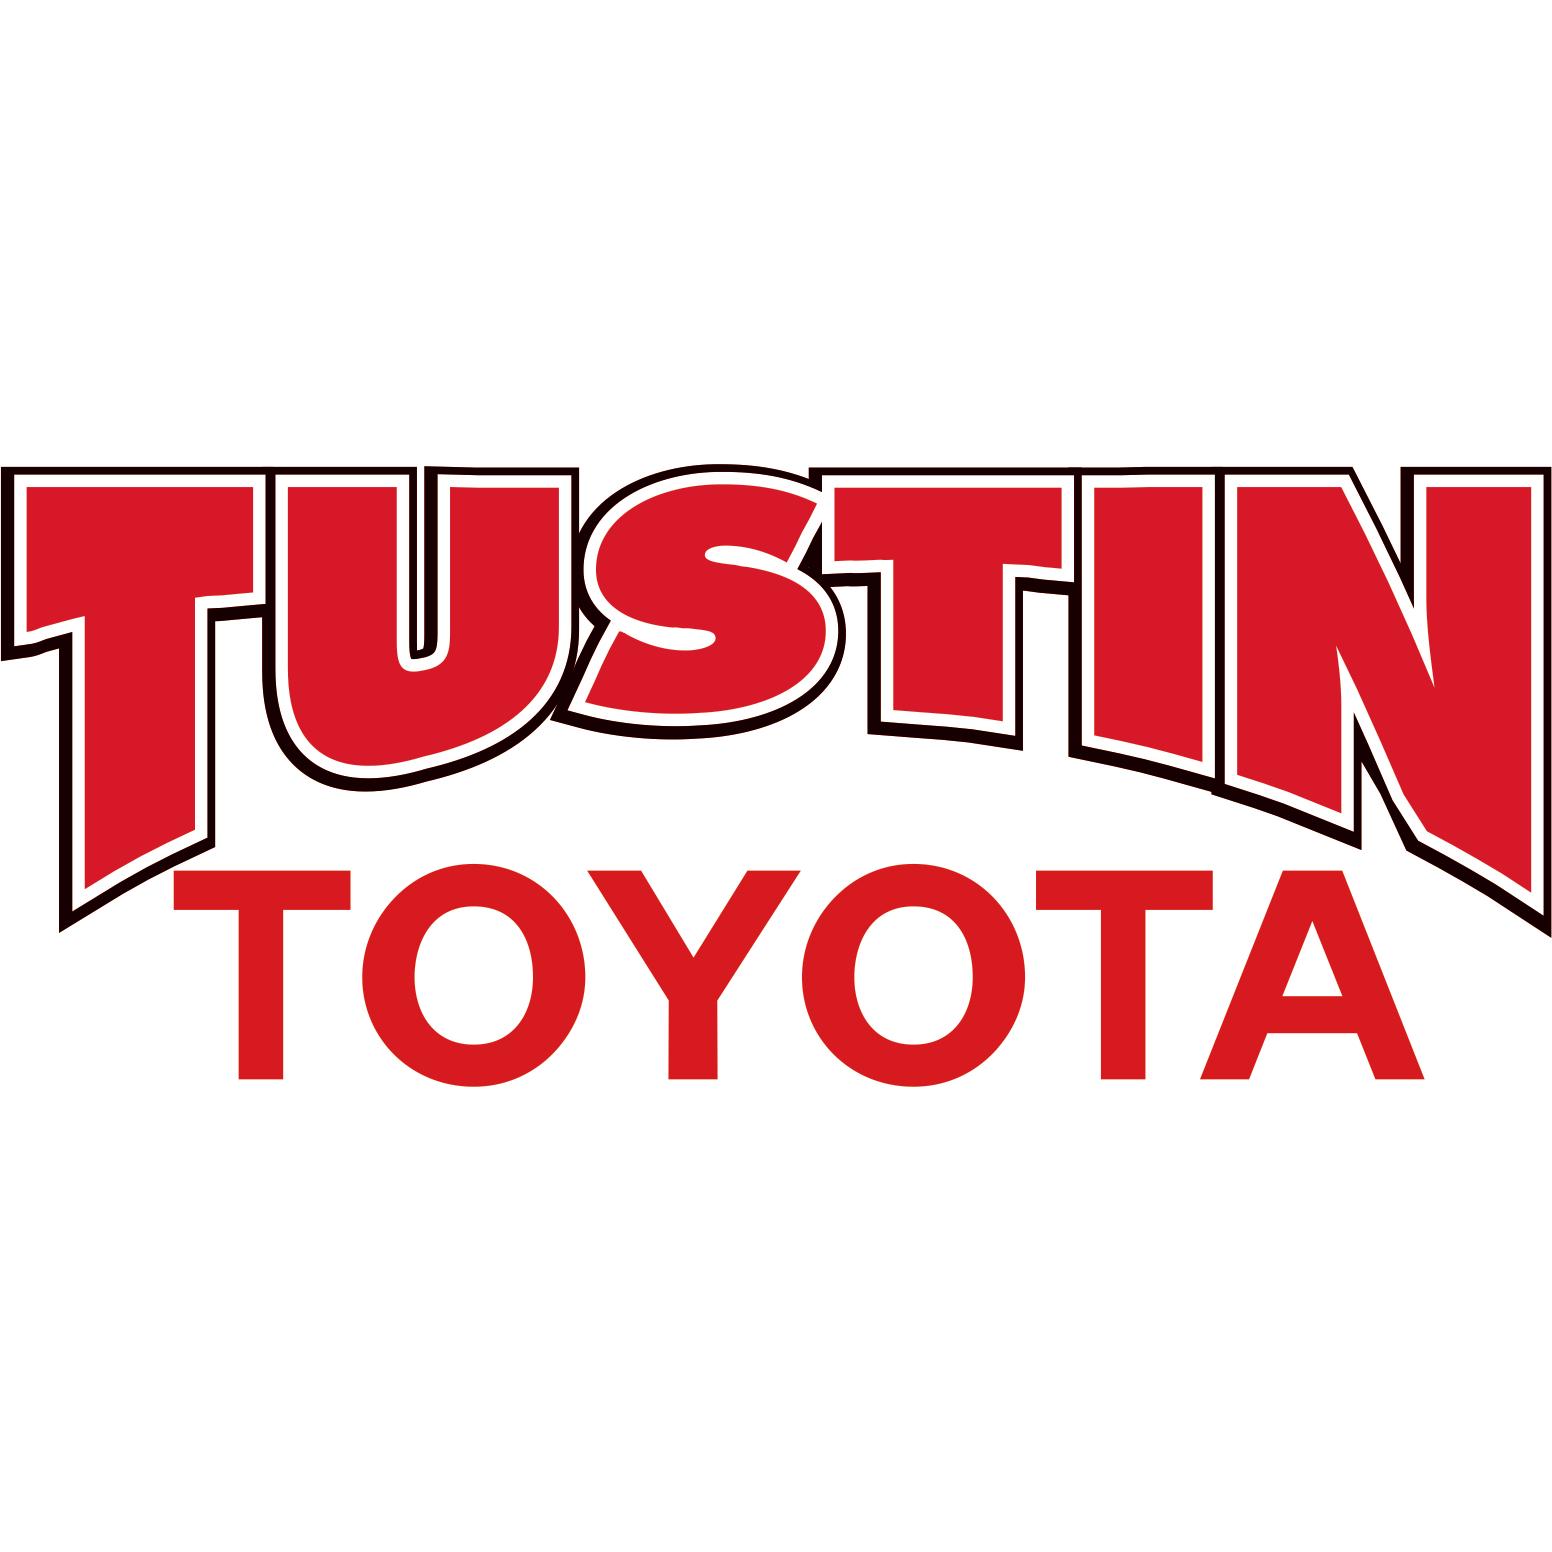 Tustin Toyota - Tustin, CA - Auto Dealers